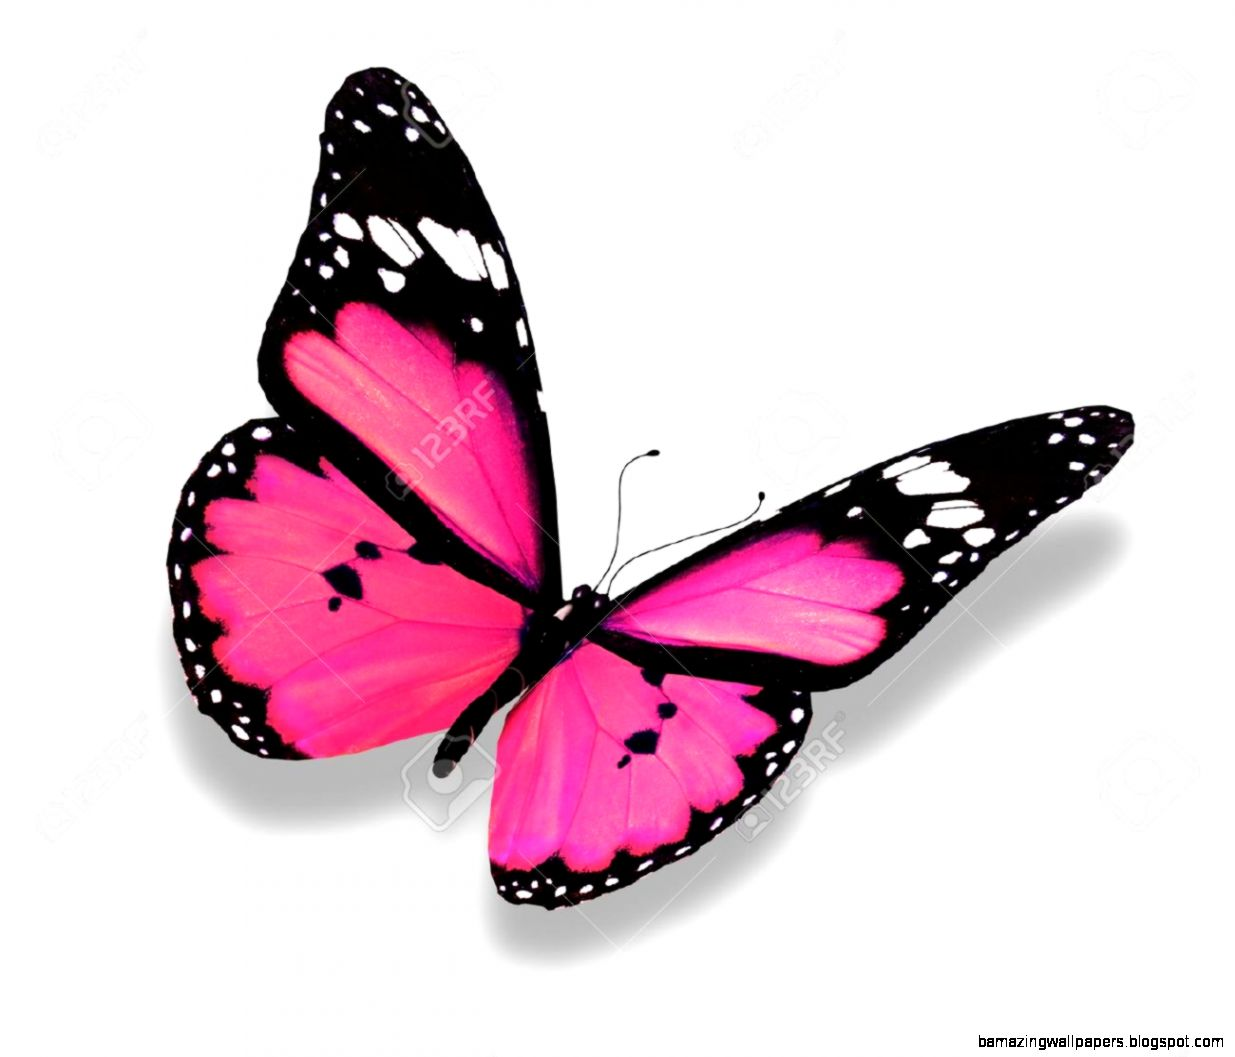 http://3.bp.blogspot.com/-bBEyL8iajSU/VbulhX-DgBI/AAAAAAAAPys/e3vCrkLCtrE/s1600/pink-butterfly-stock-photos-images-royalty-free-pink-butterfly.jpg Pink Butterfly Graphics